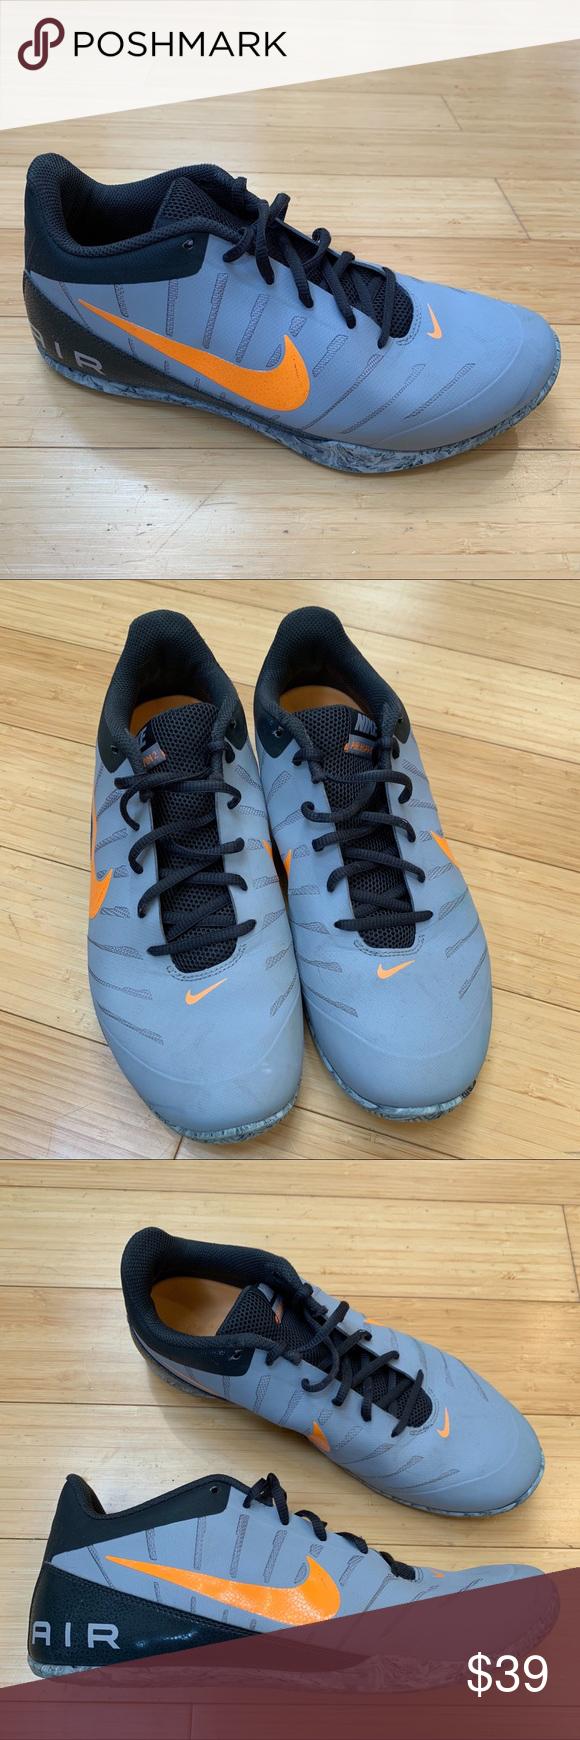 68d2d71a988bf NIKE Air Maven 2 low basketball sneakers men's 9.5 Nike Air Maven II ...